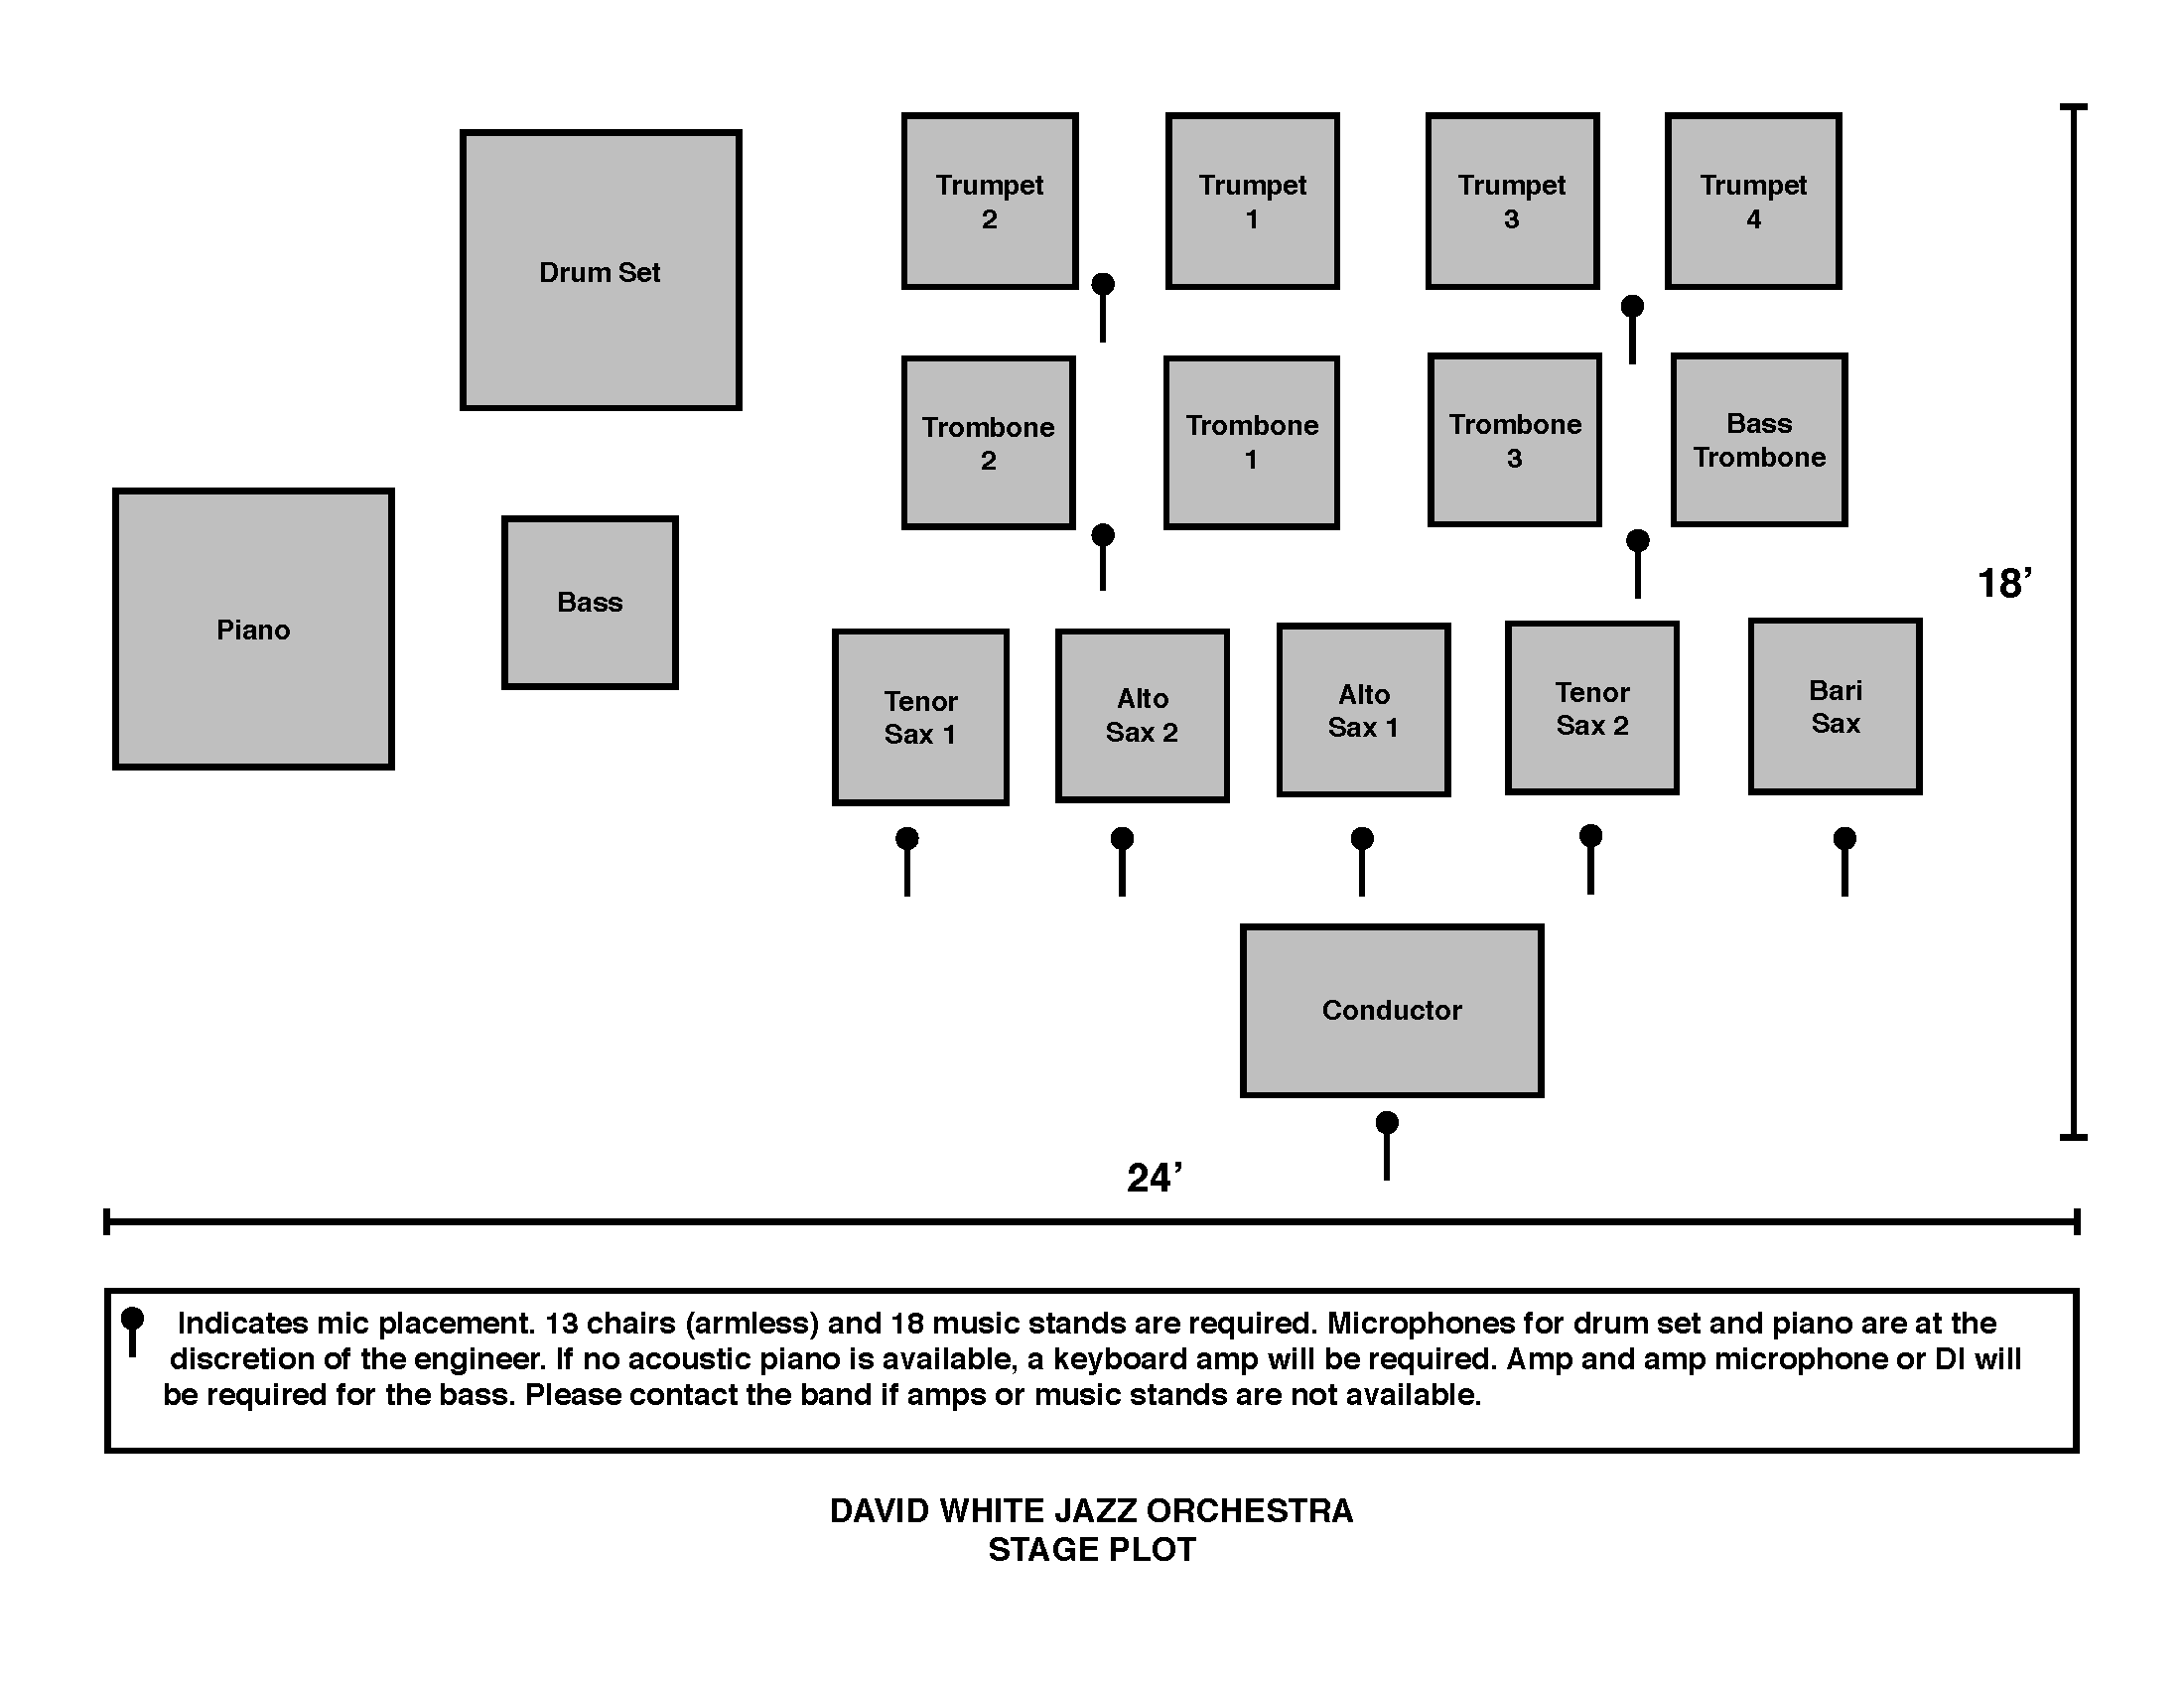 17 - piece stage plot